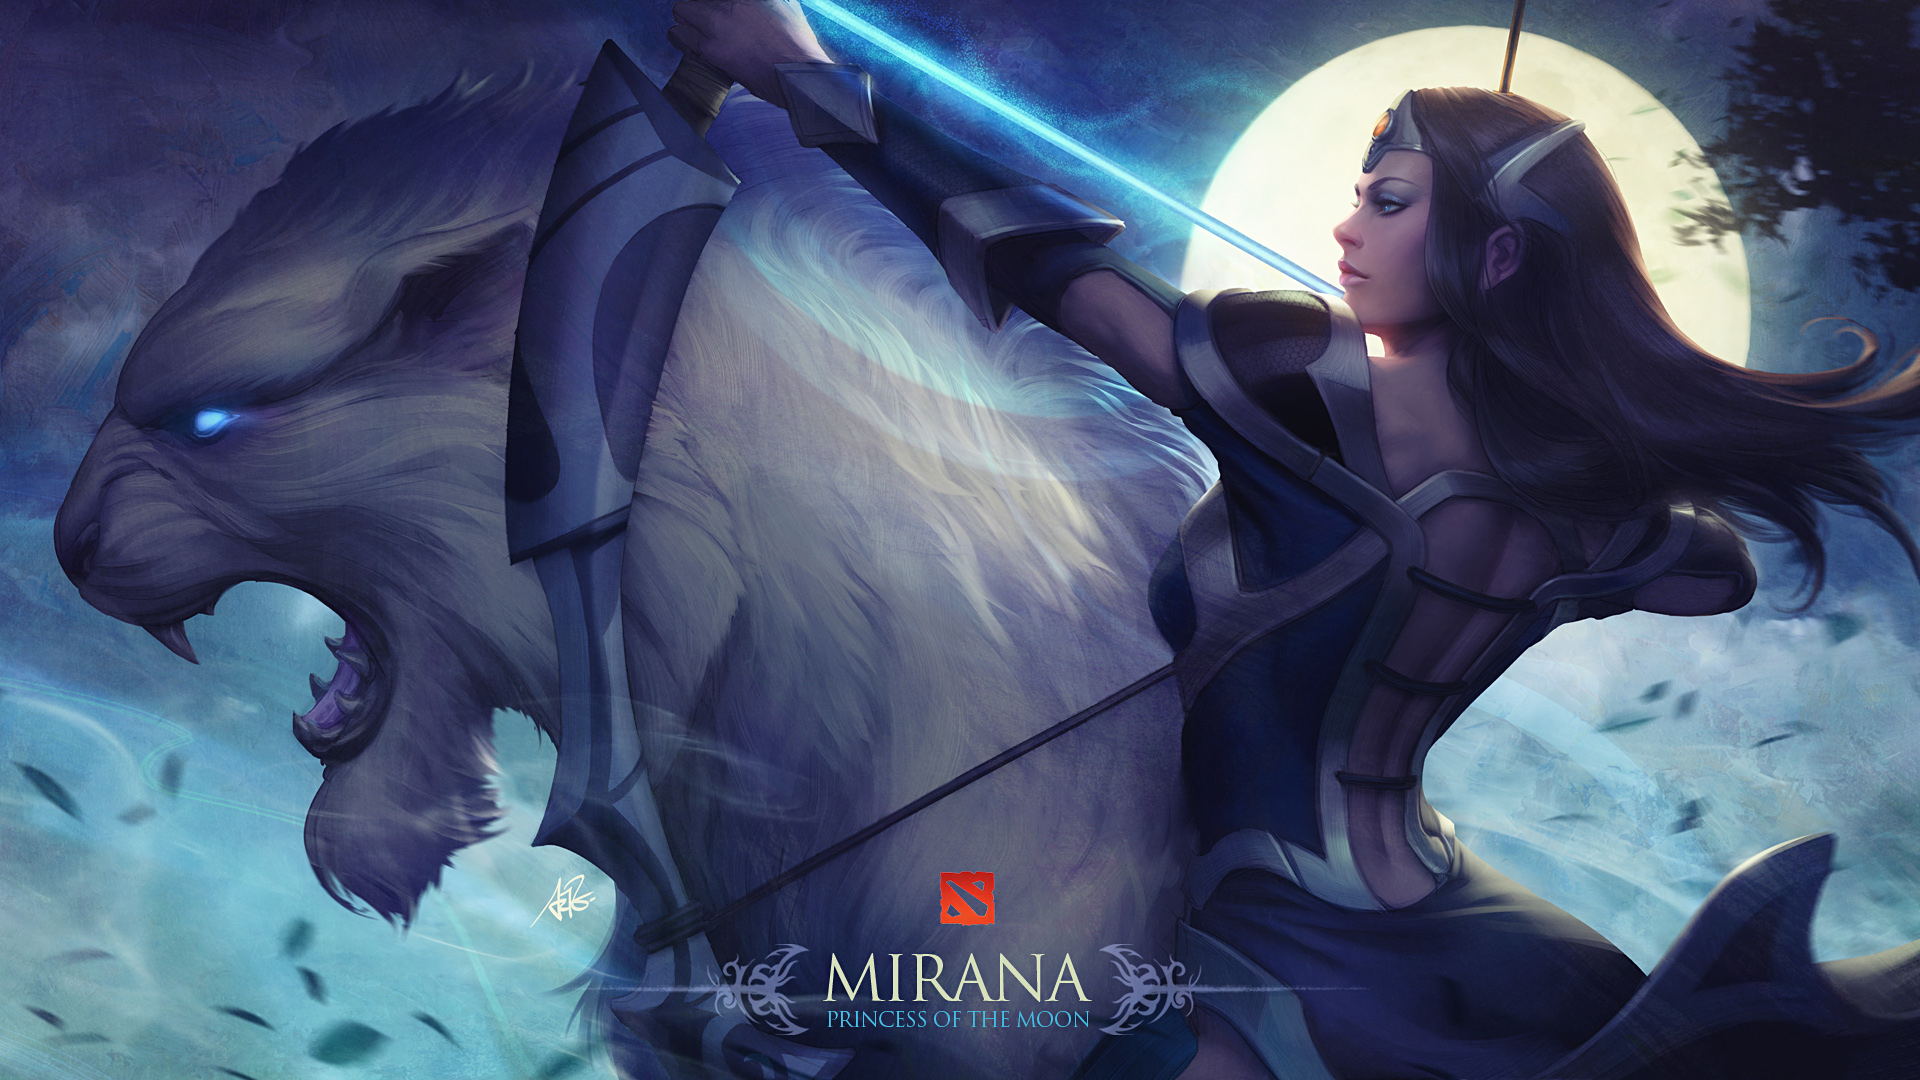 Mirana Dota 2 Artwork Hd Celebrities 4k Wallpapers Images